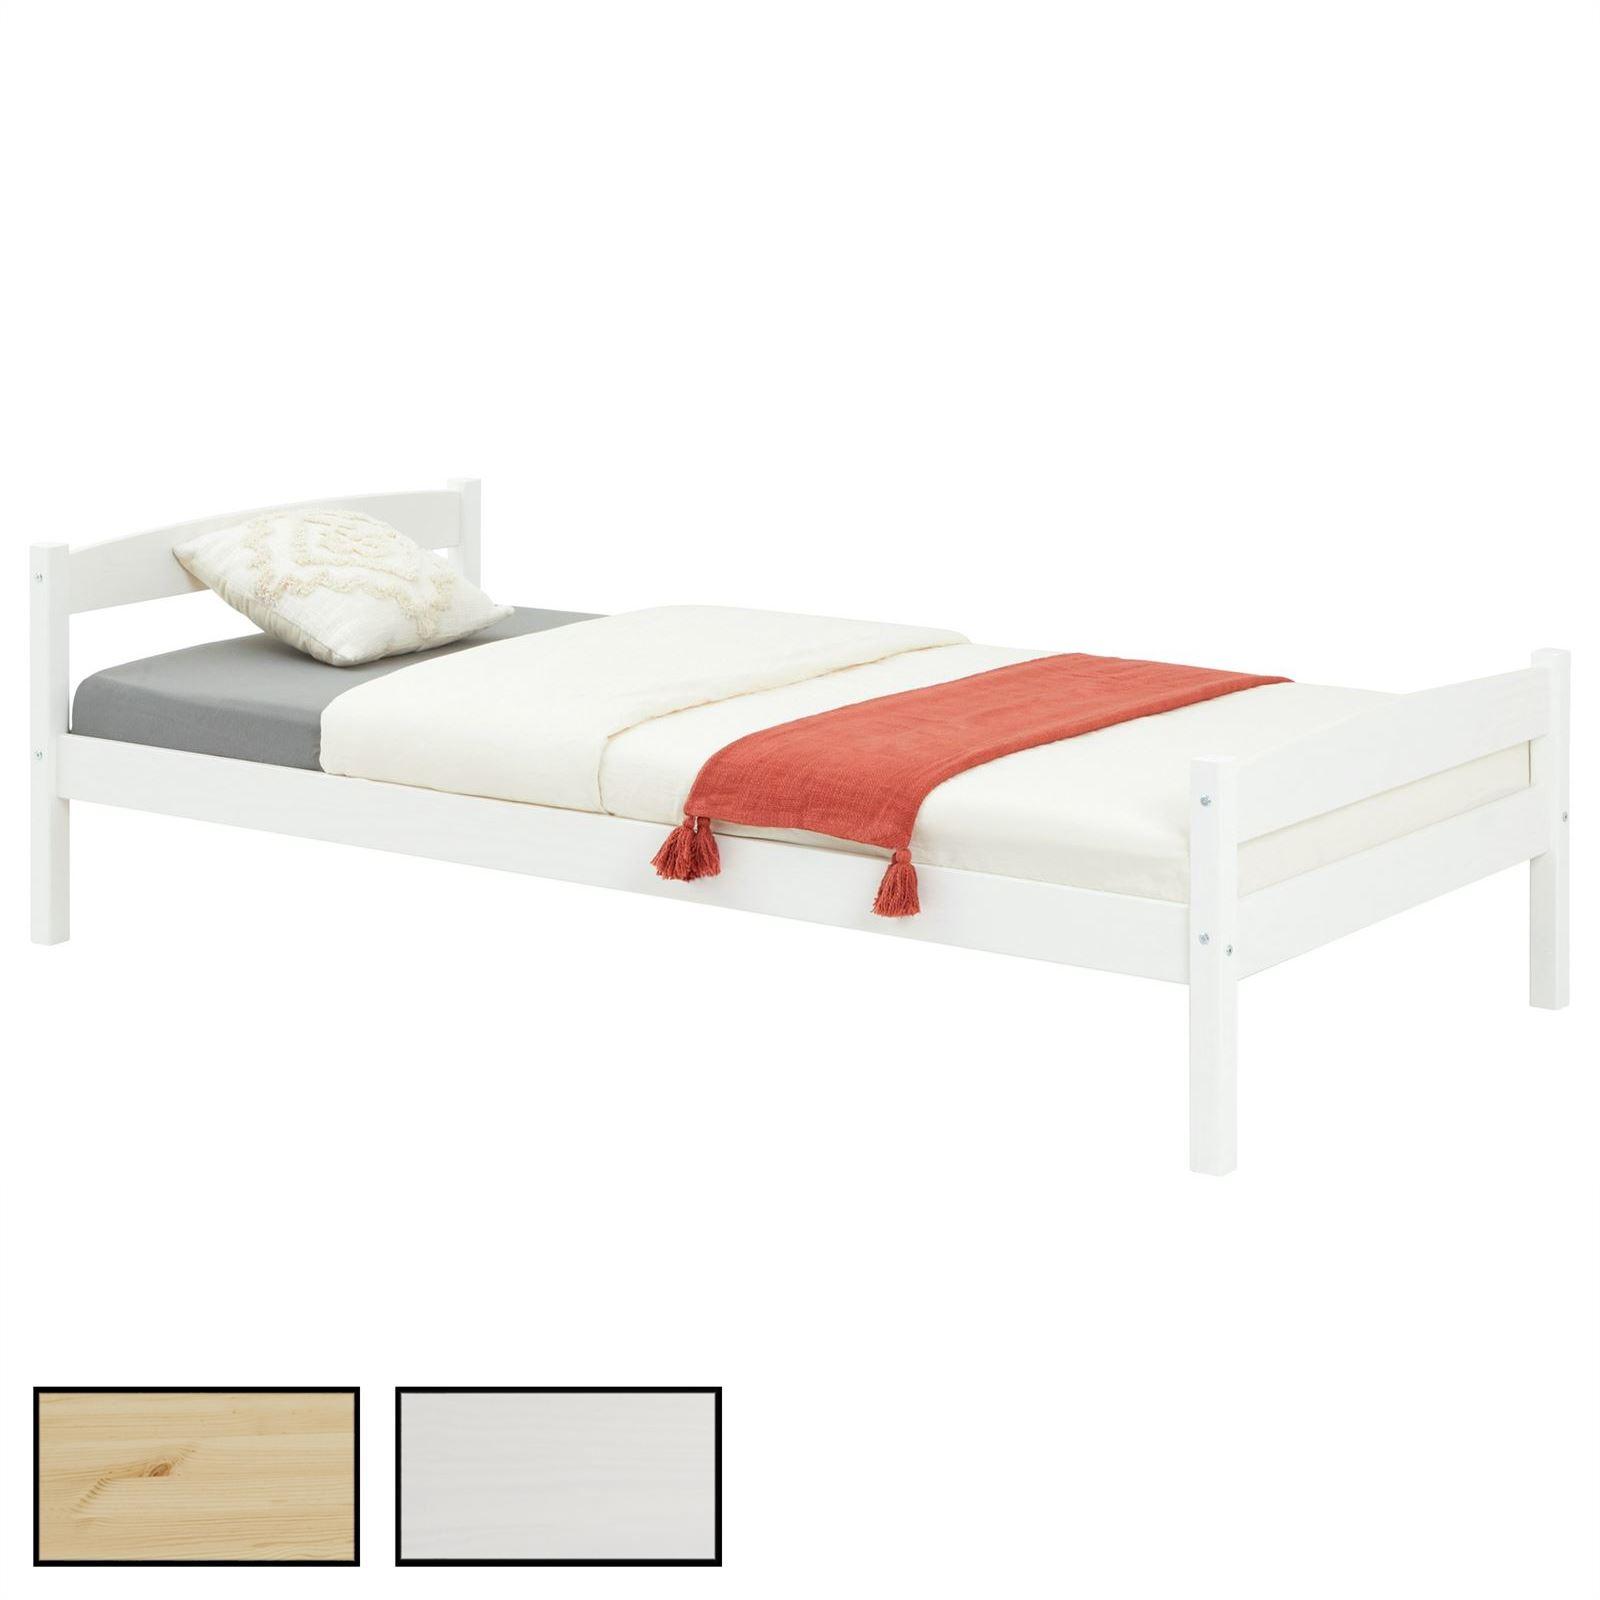 einzelbett felix 90 x 190 cm in 2 farben mobilia24. Black Bedroom Furniture Sets. Home Design Ideas